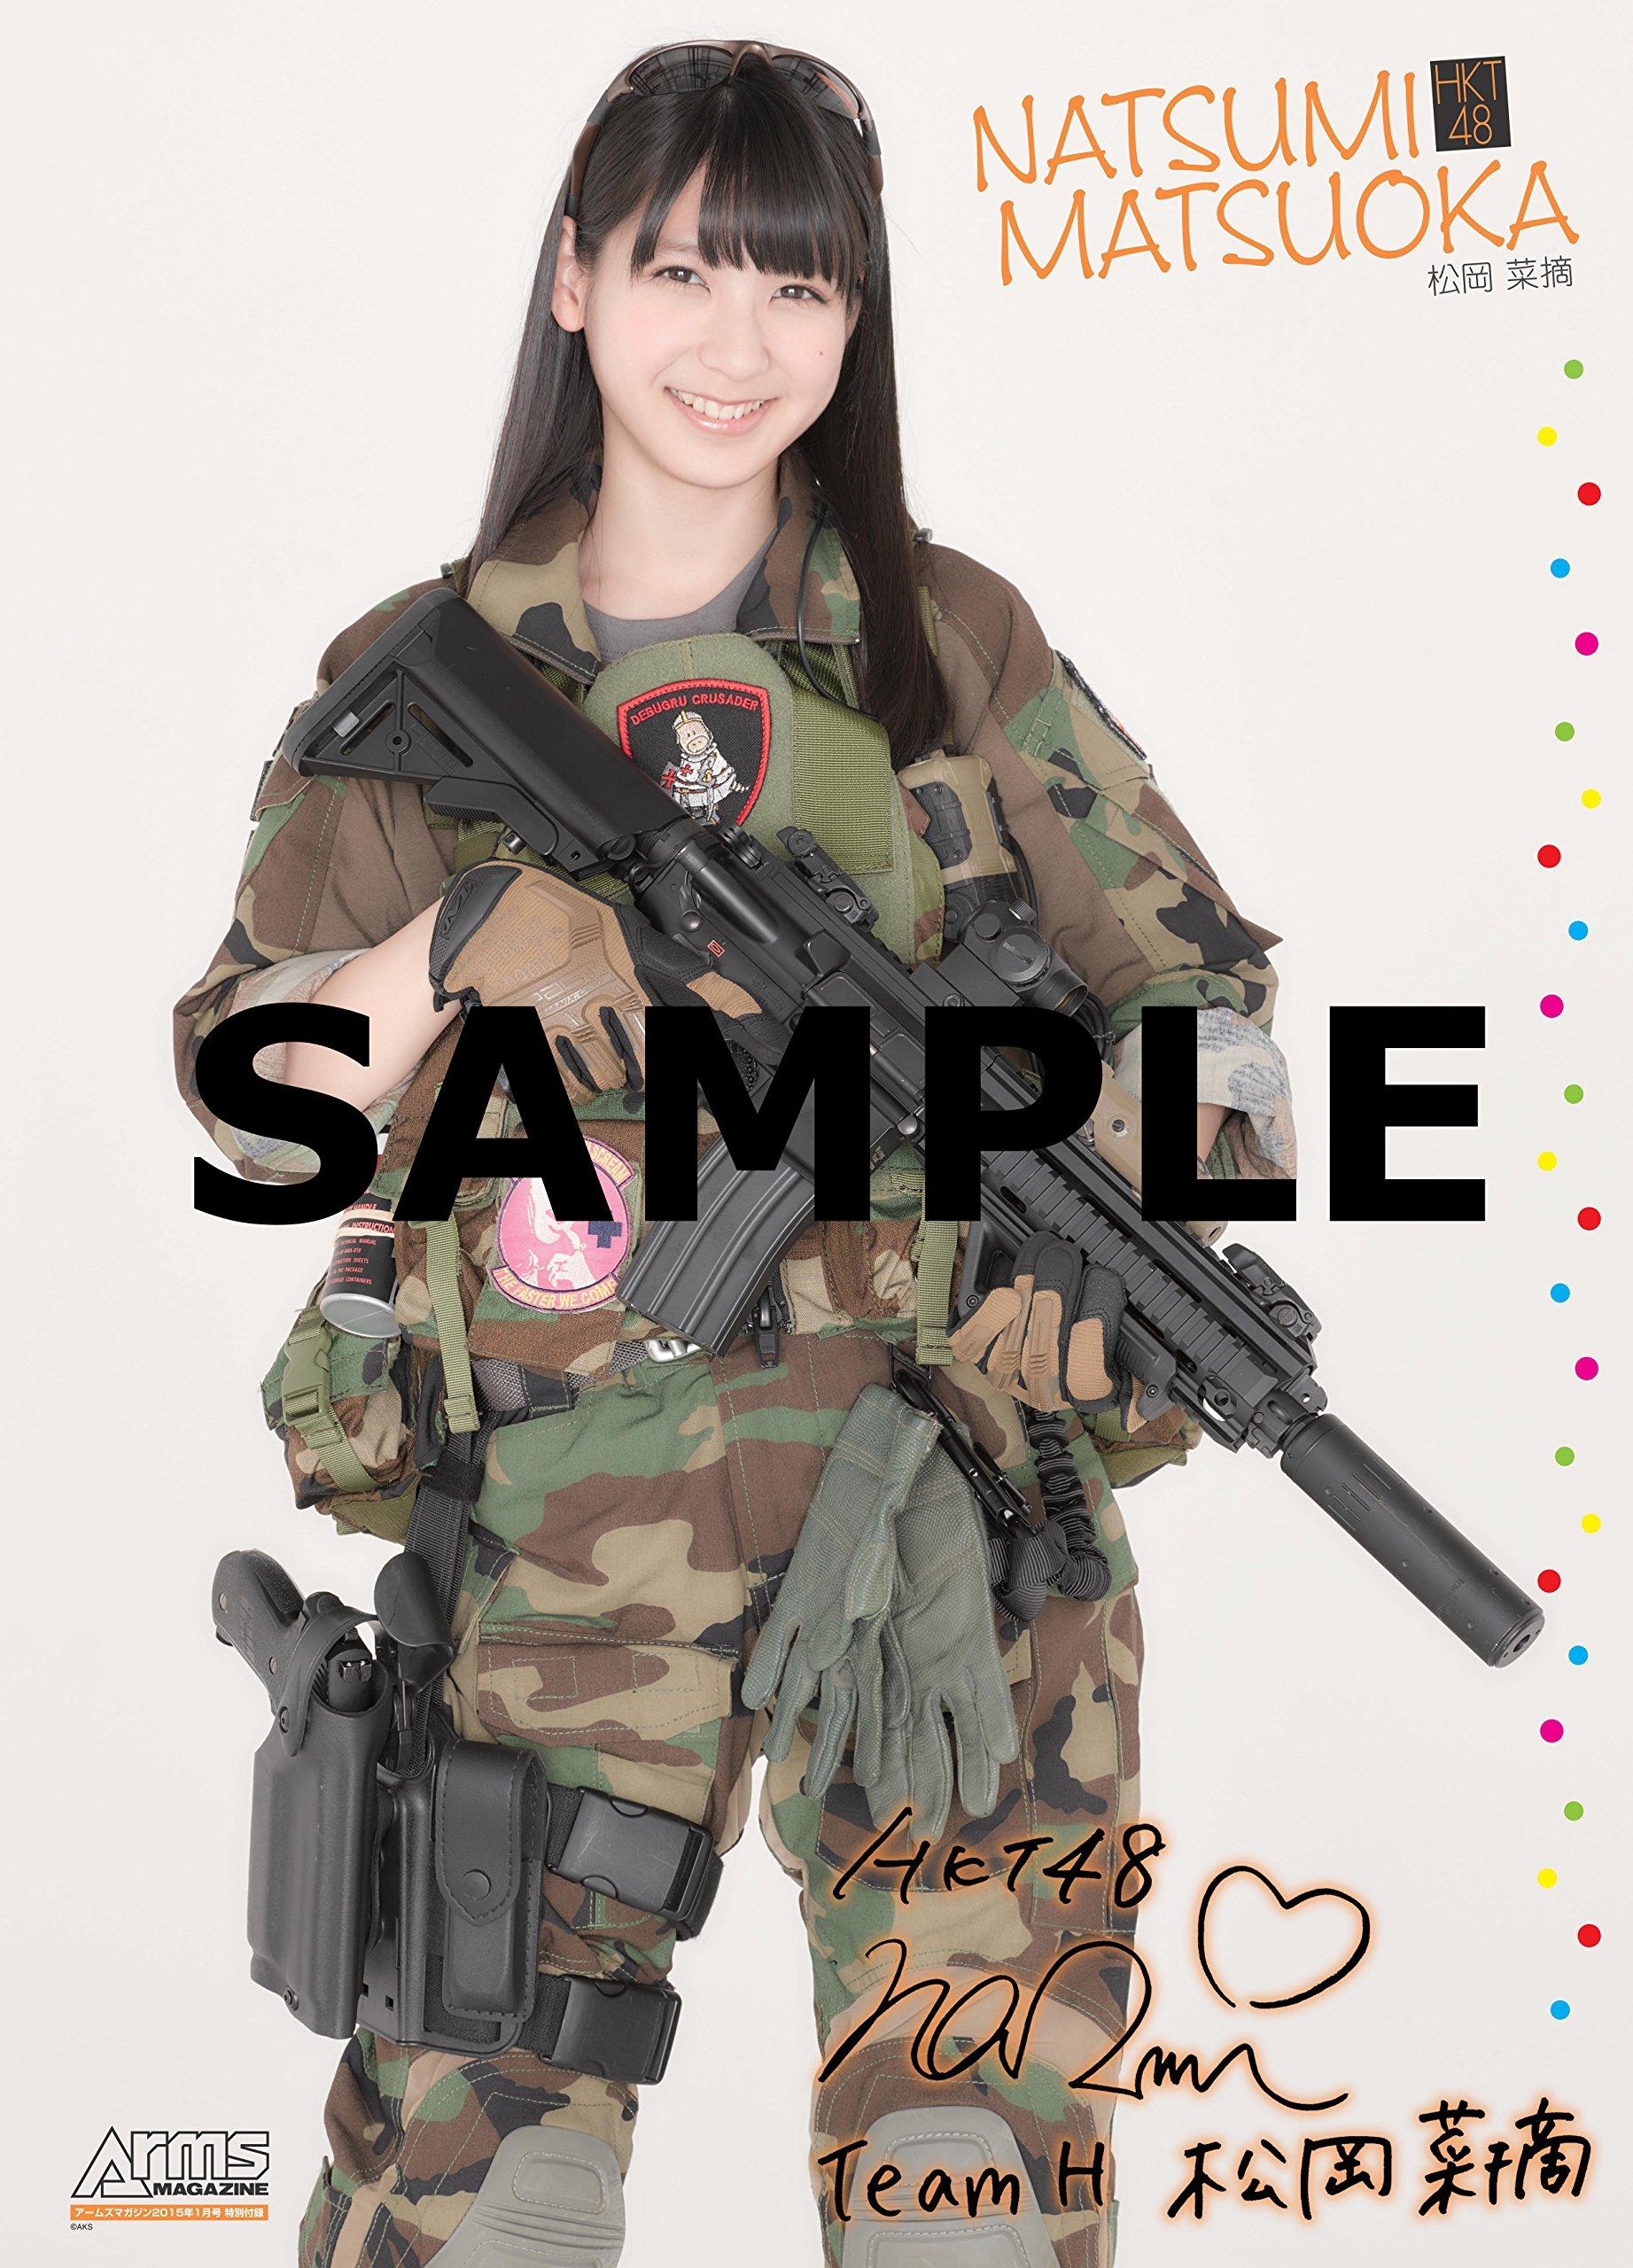 HKT48森保まどか&松岡菜摘 表紙 月刊Arms MAGAZINEアームズマガジン 2015年1月号  (2)